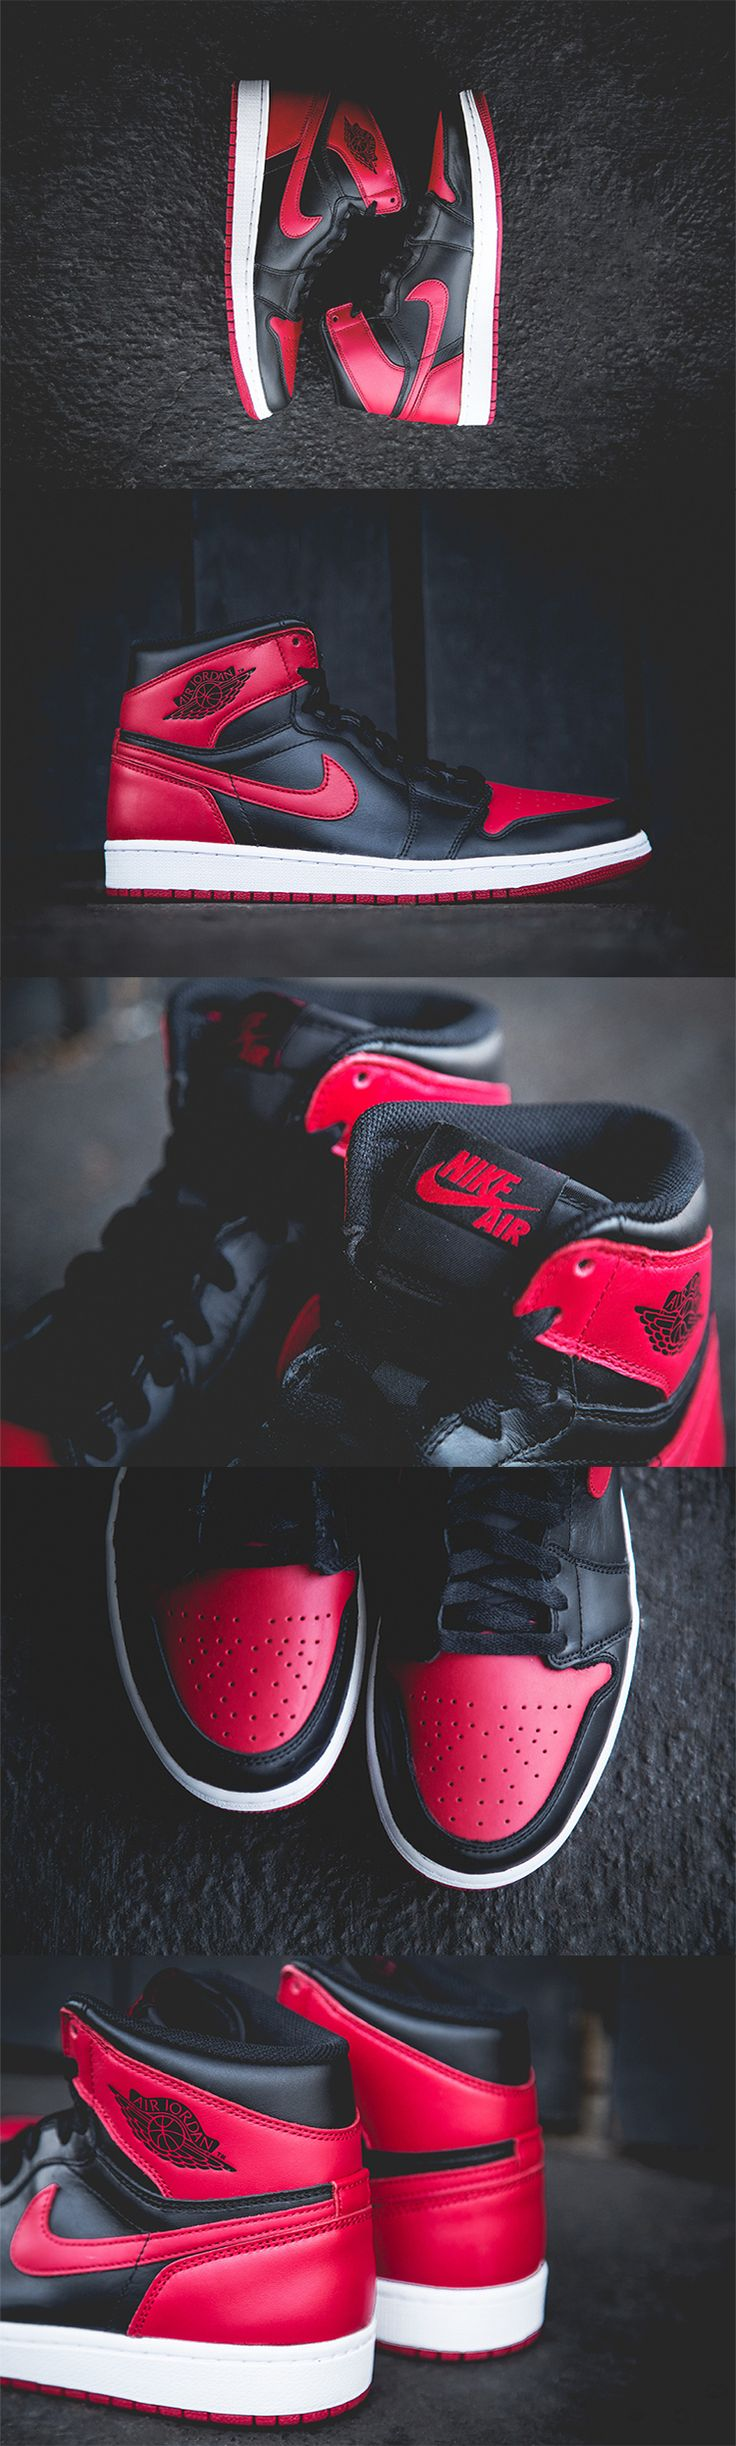 "Air Jordan 1 Retro - ""Bred"" New Hip Hop Beats Uploaded EVERY SINGLE ..."